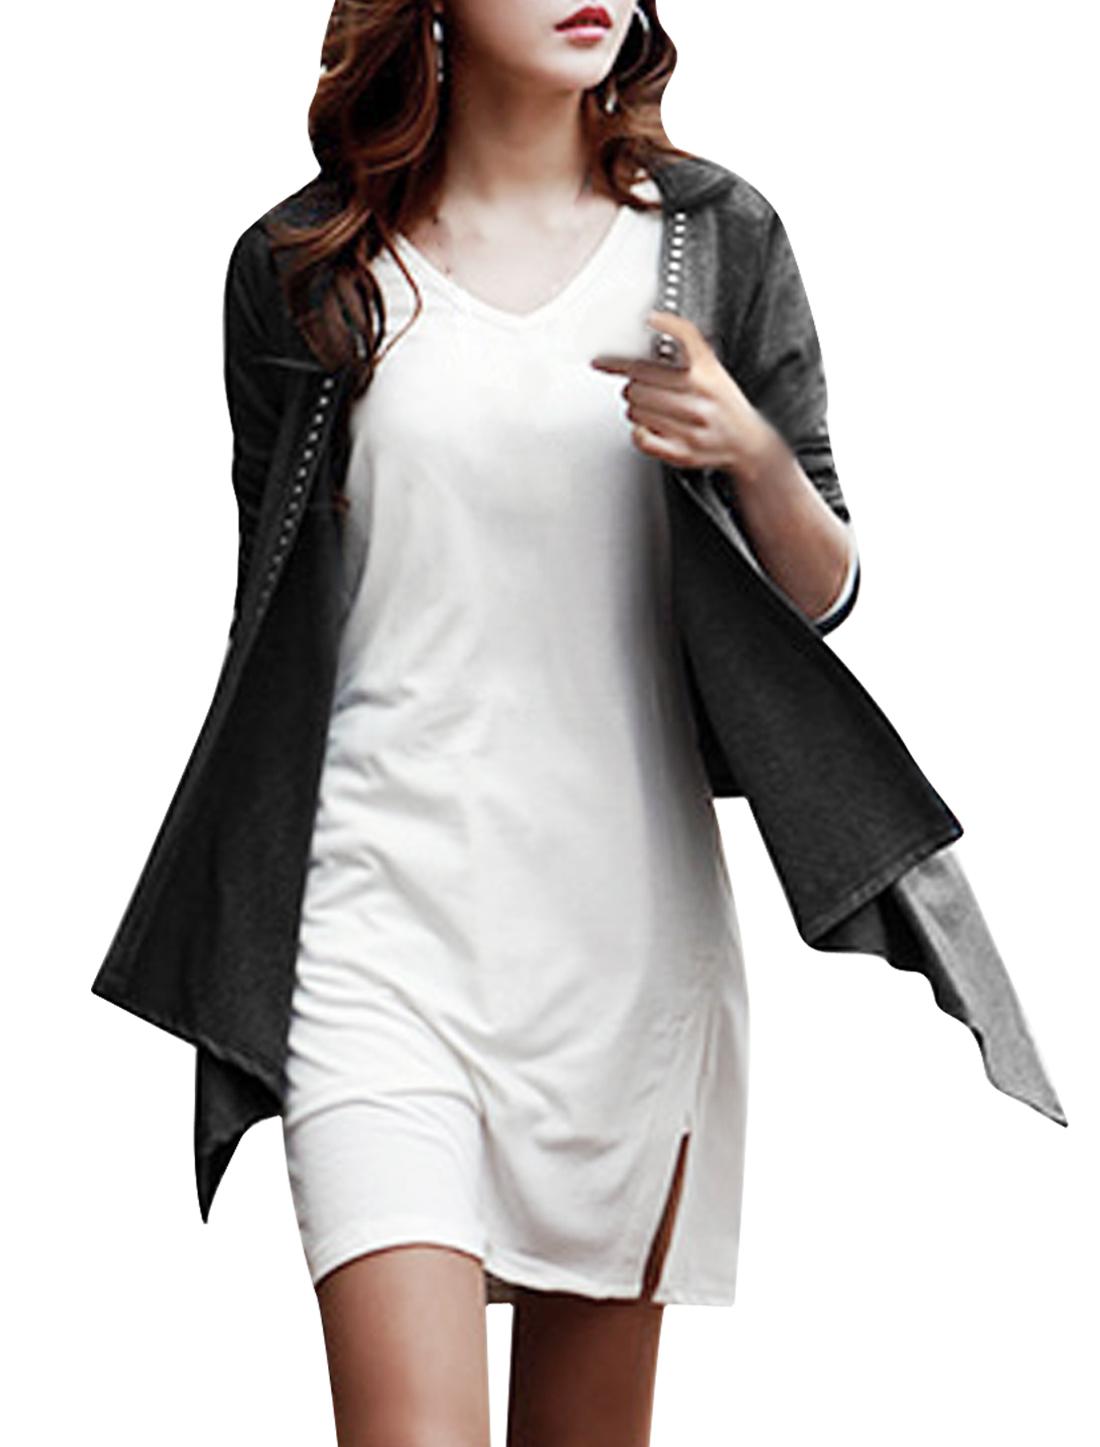 Women's Front Opening Rivet Decor Long Sleeves Stylish Dark Gray Cardigan S